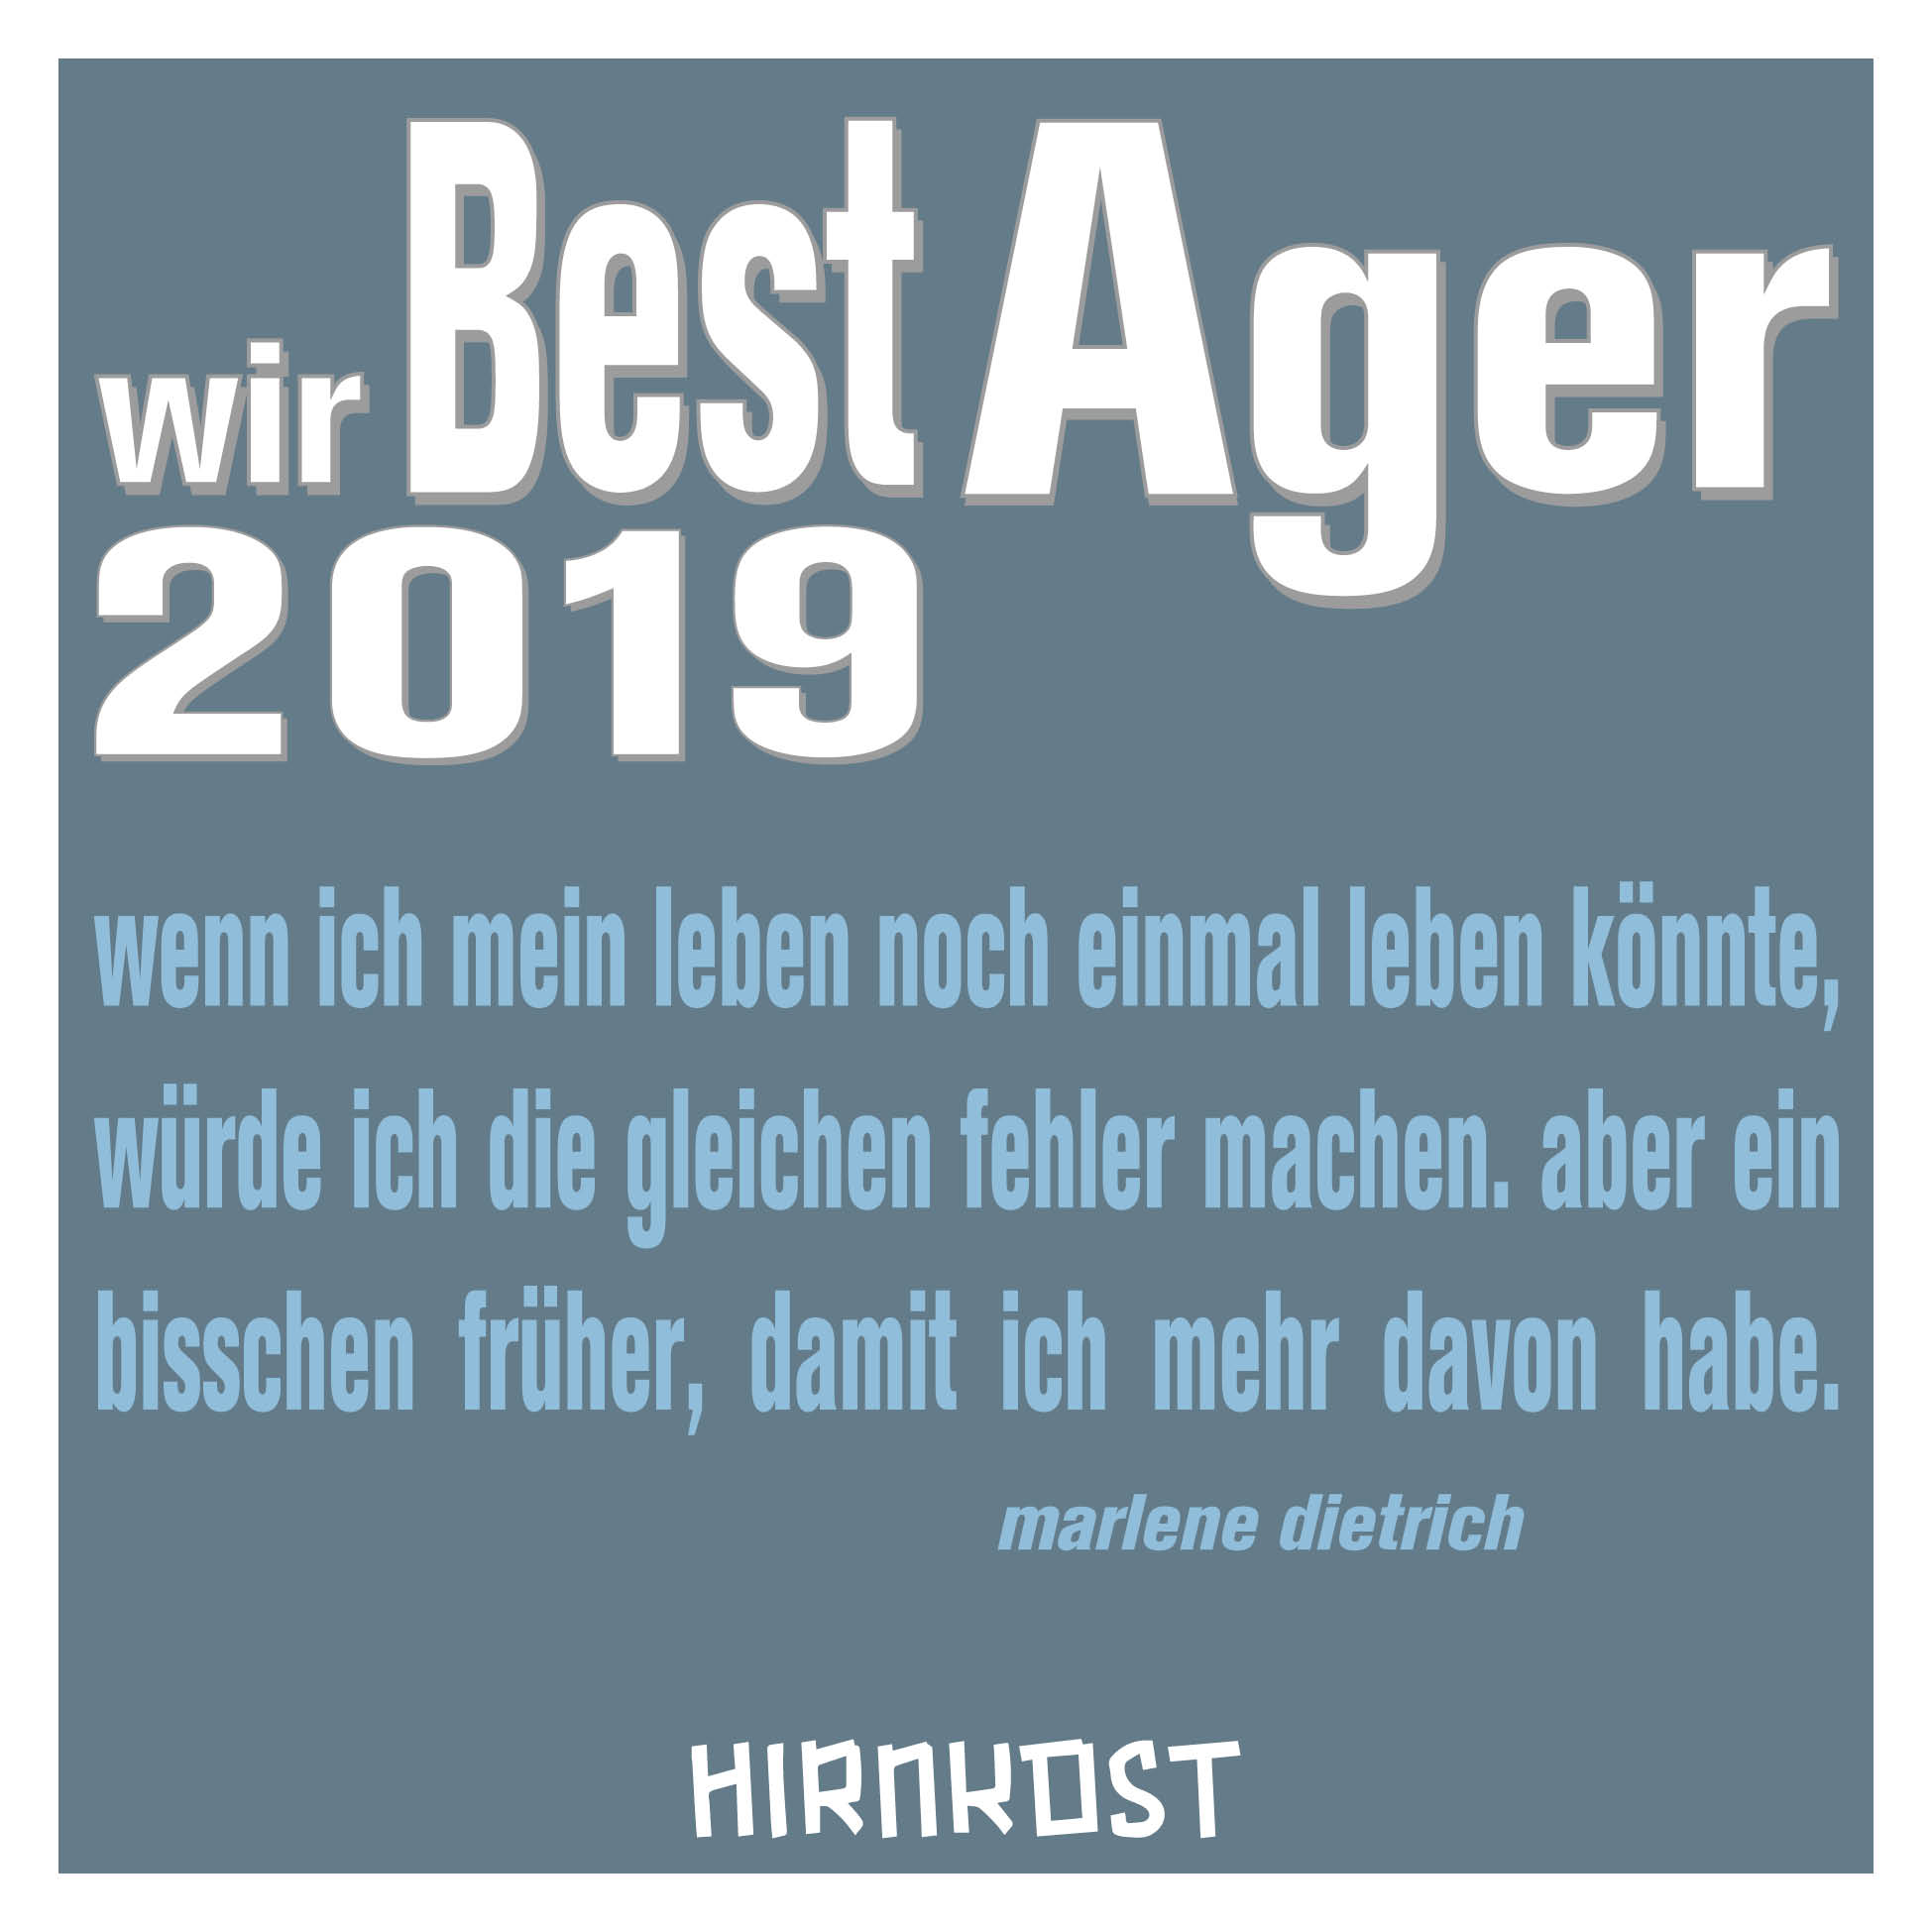 Kalender – Wir Best Ager 2019